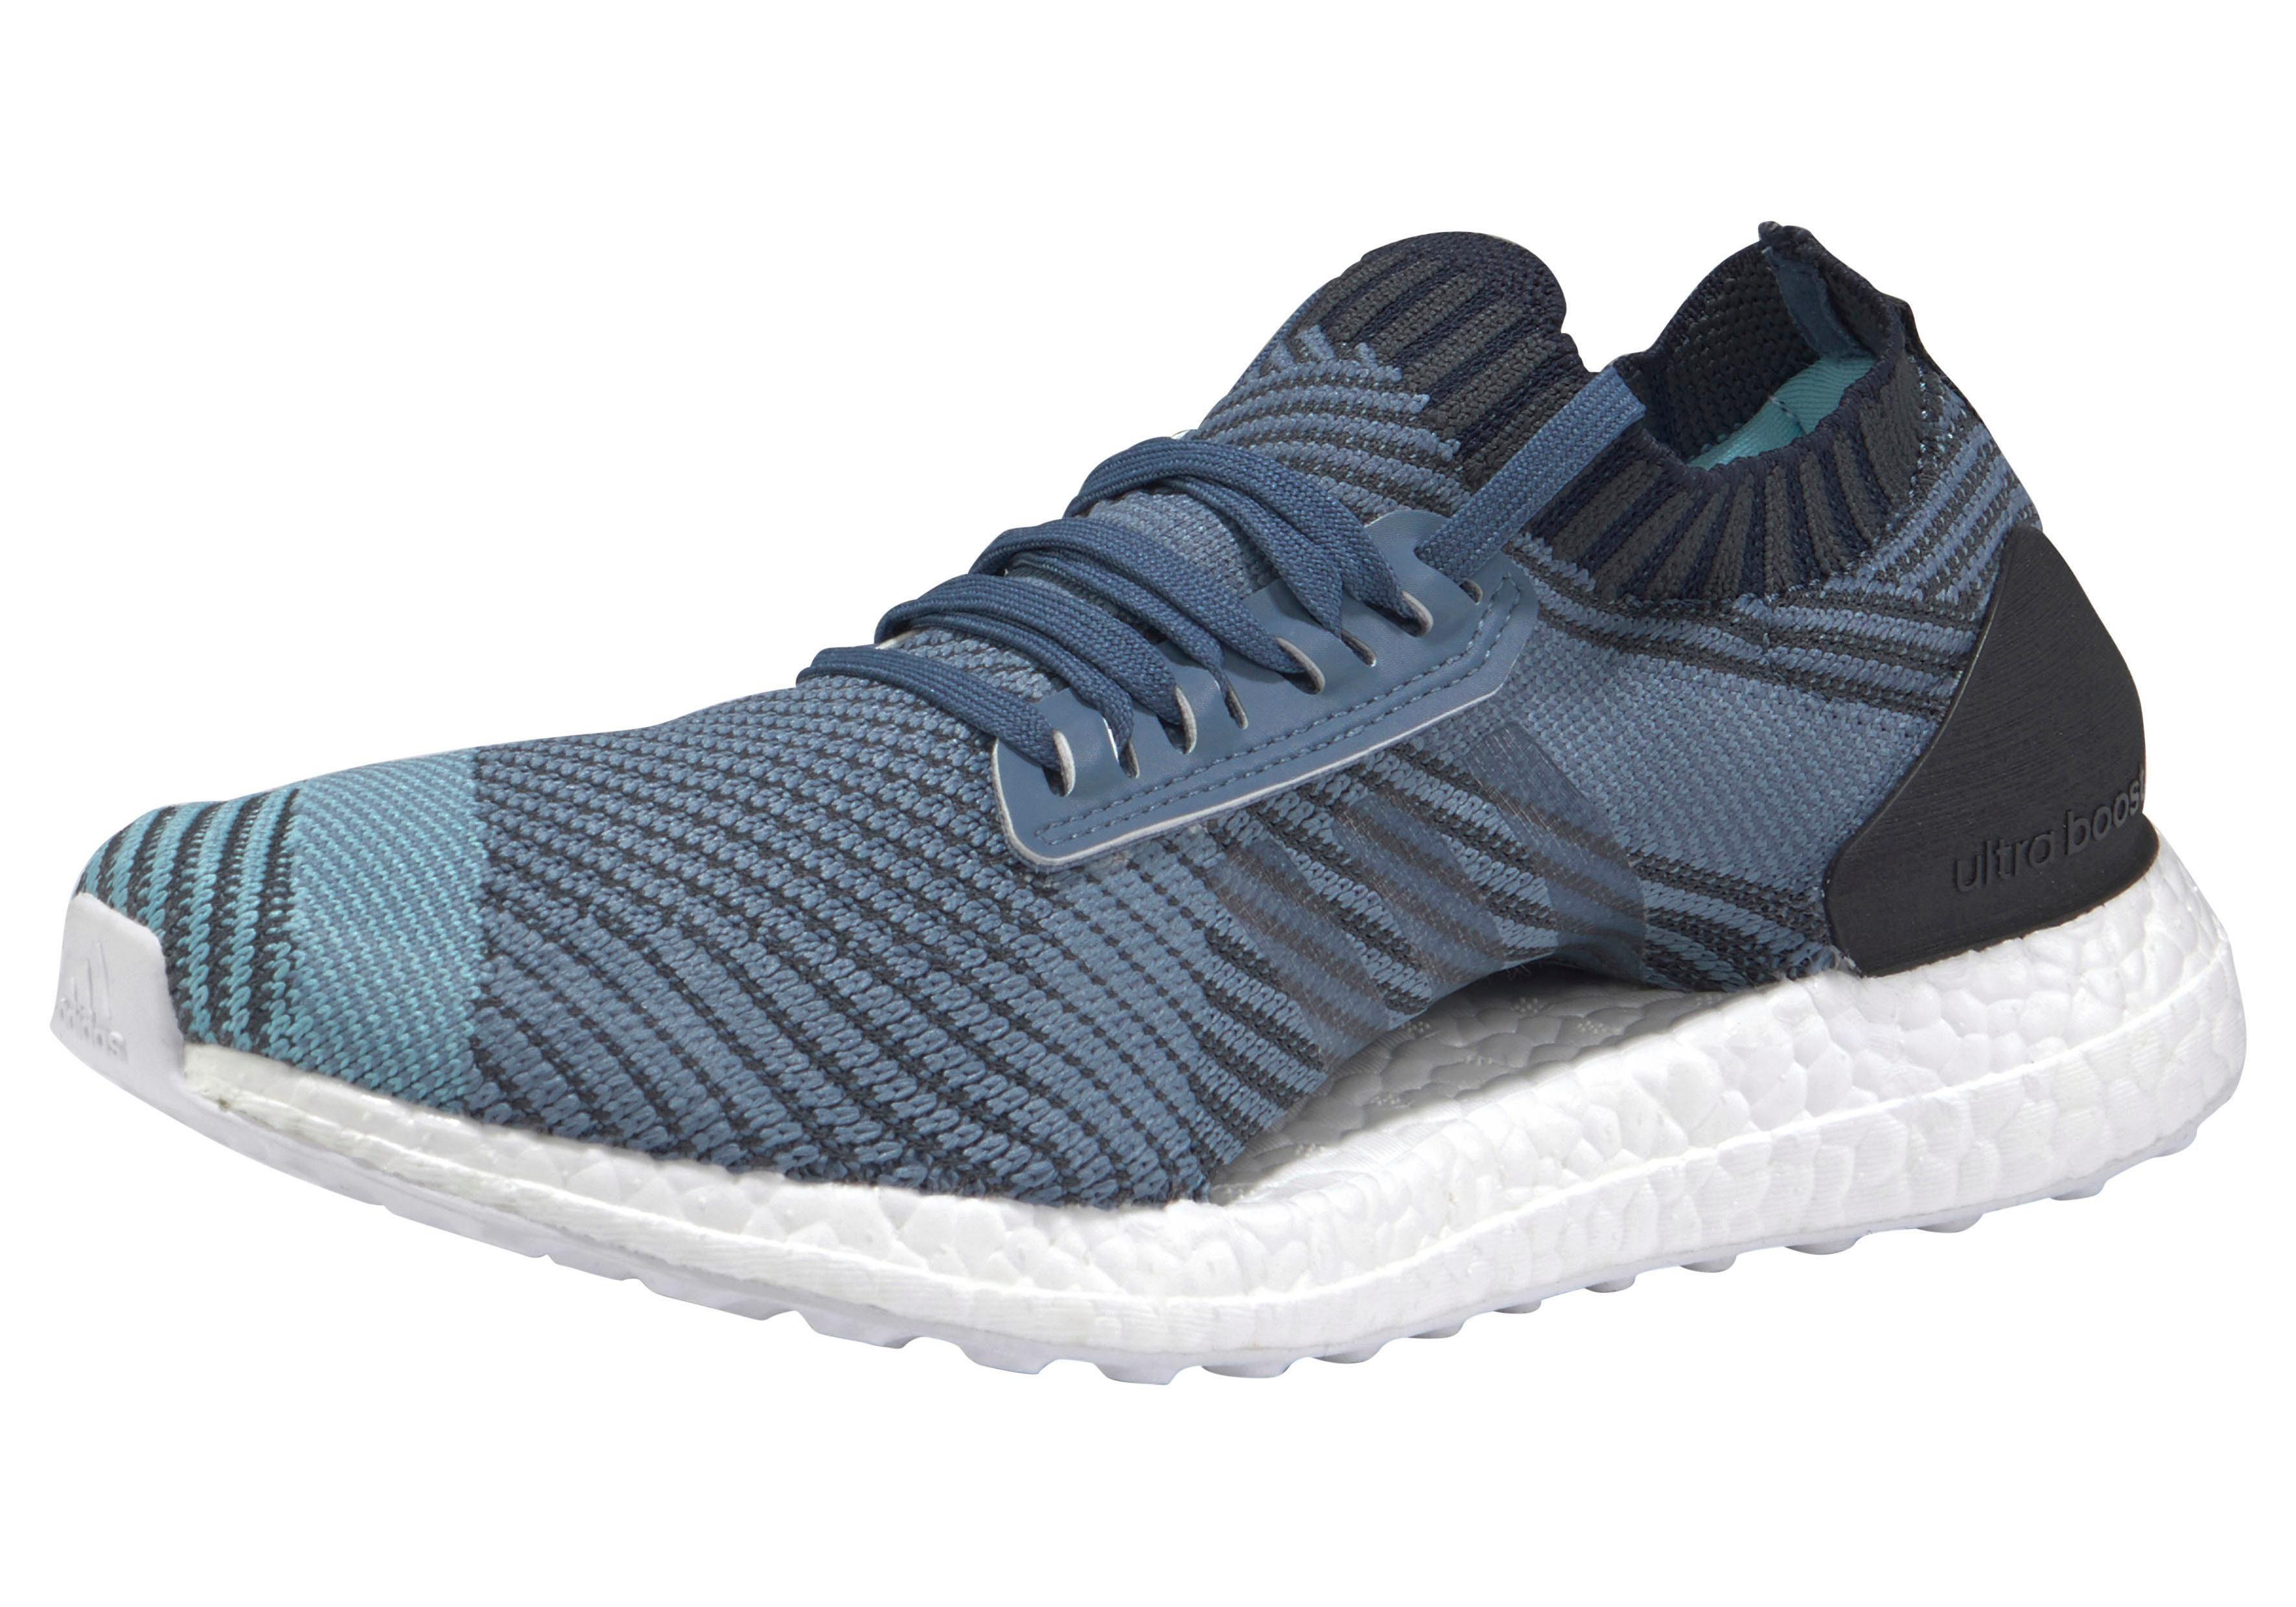 adidas Performance Ultra Boost X Parley Laufschuh, Recycelte Komponenten online kaufen  rauchblau